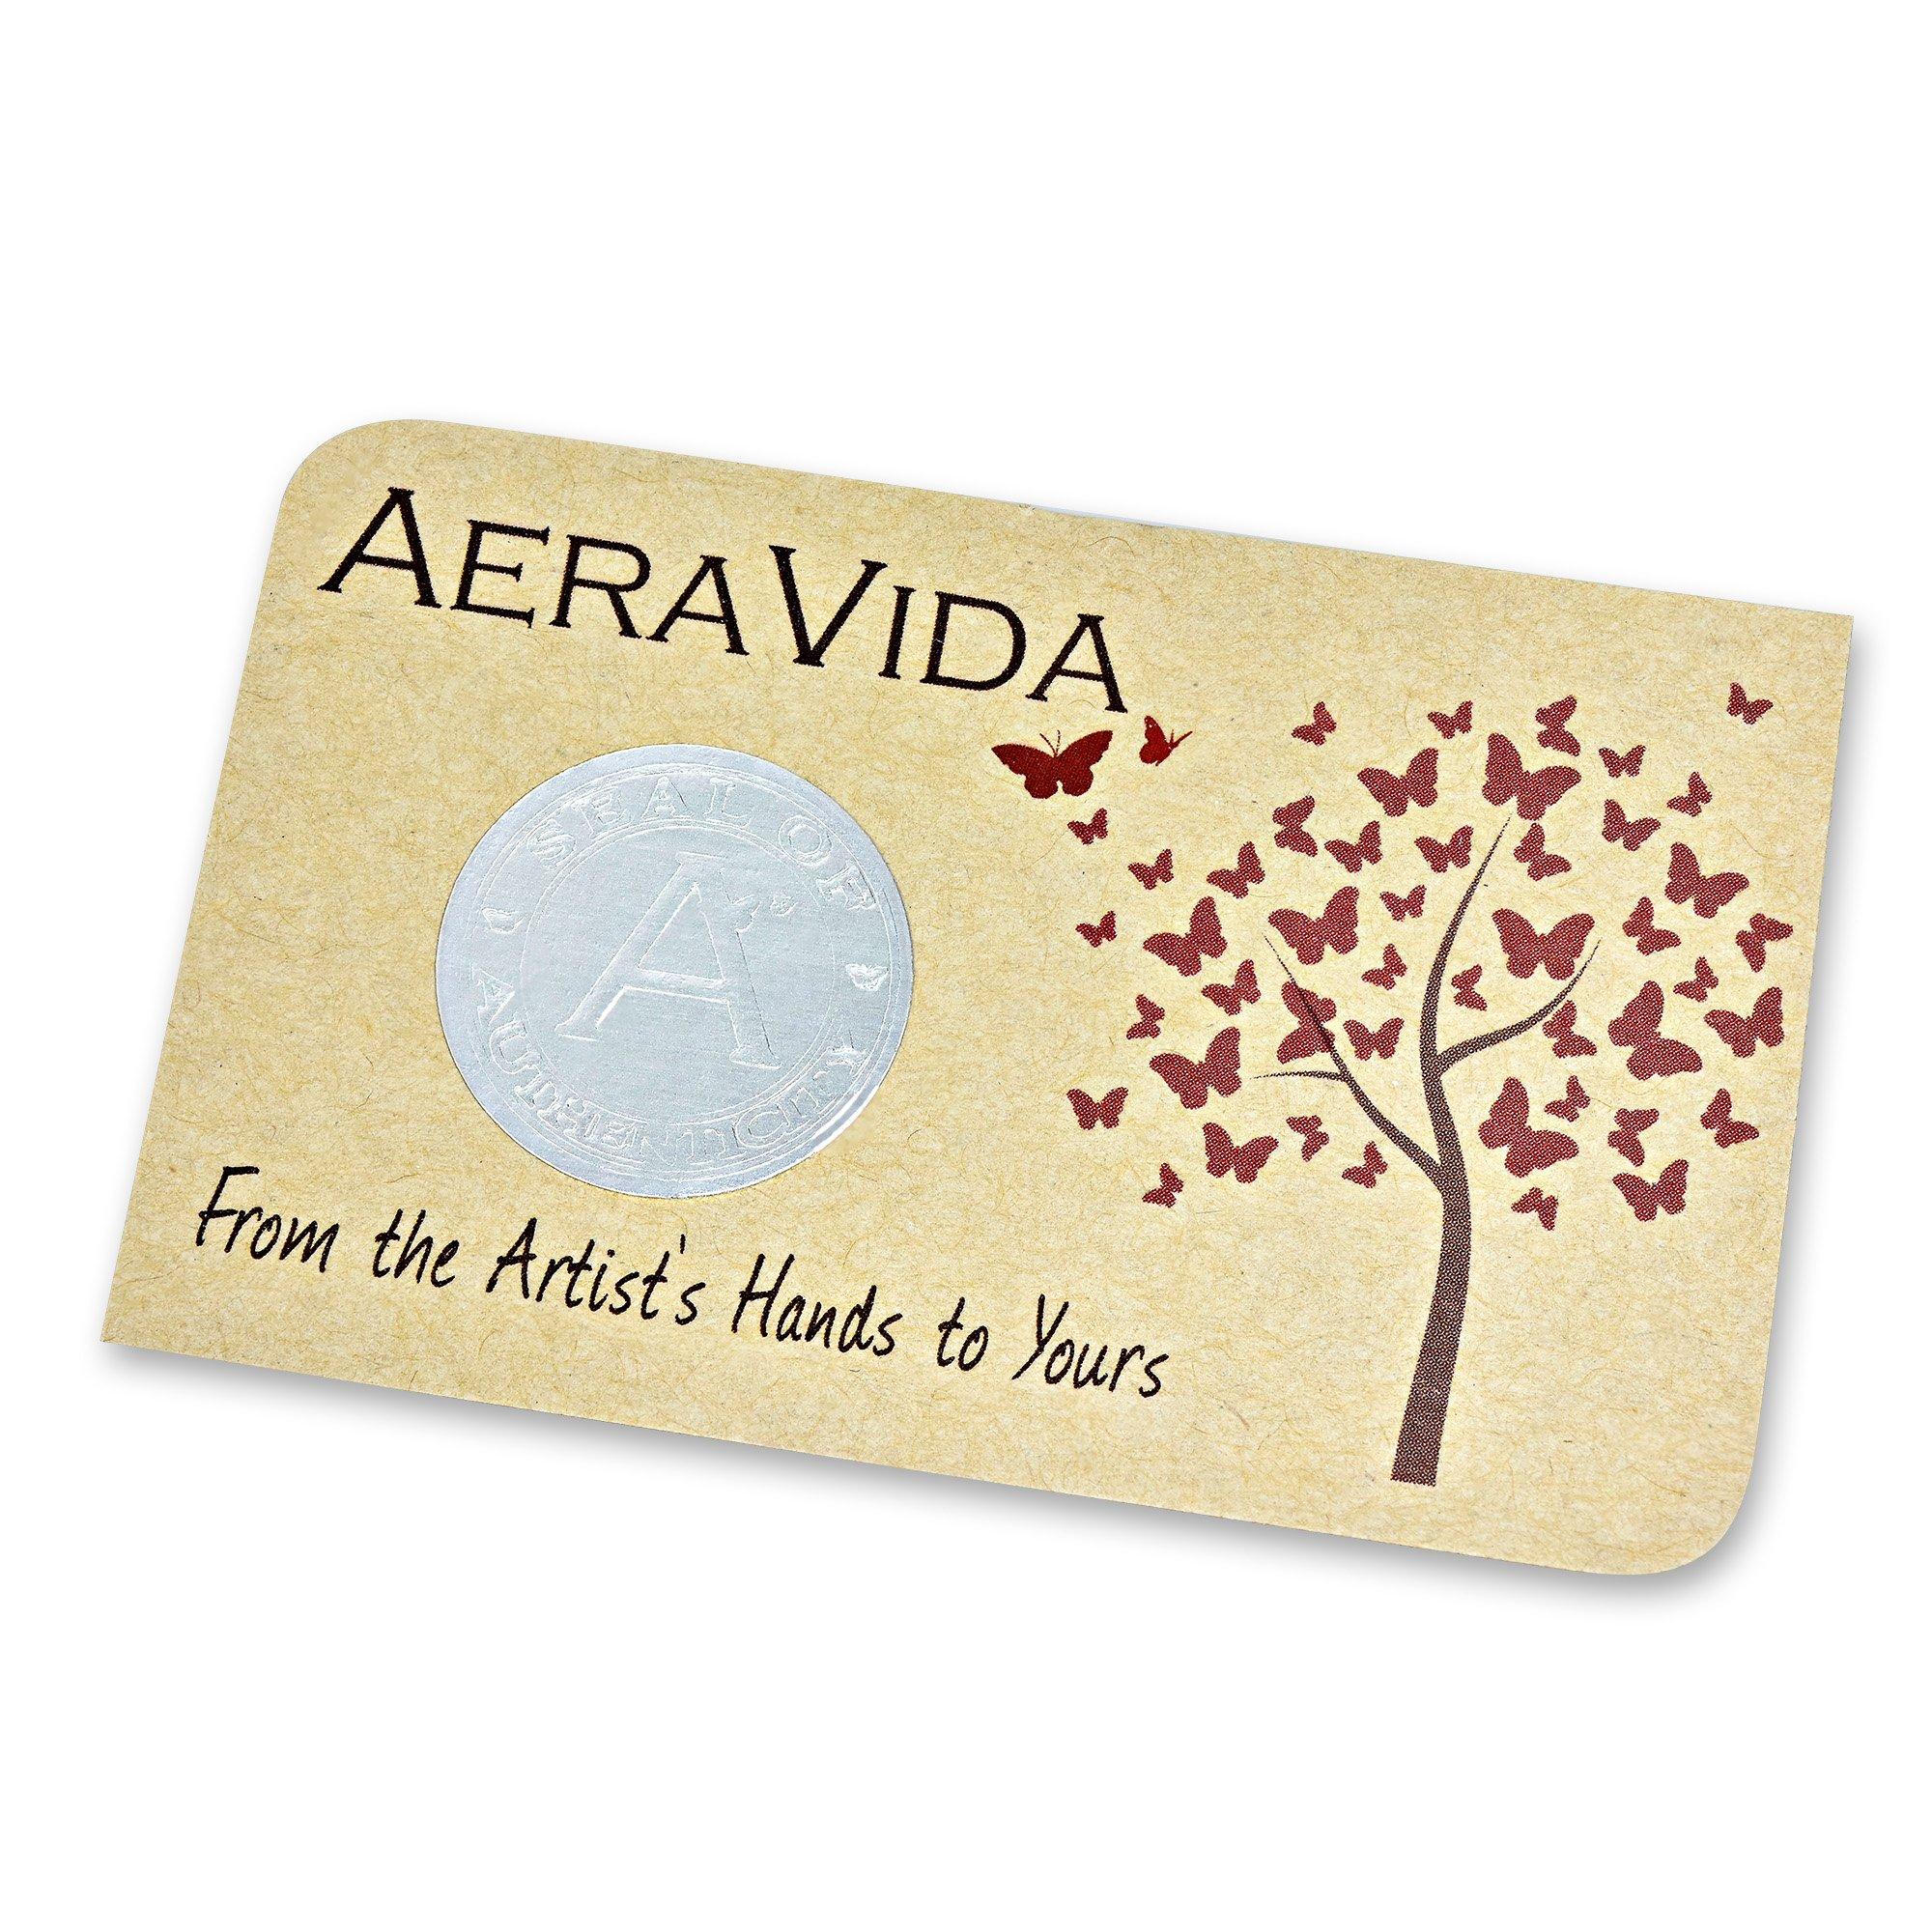 AeraVida Green Leather Mix Stones Chain Link Triple Wrap Bracelet by AeraVida (Image #3)